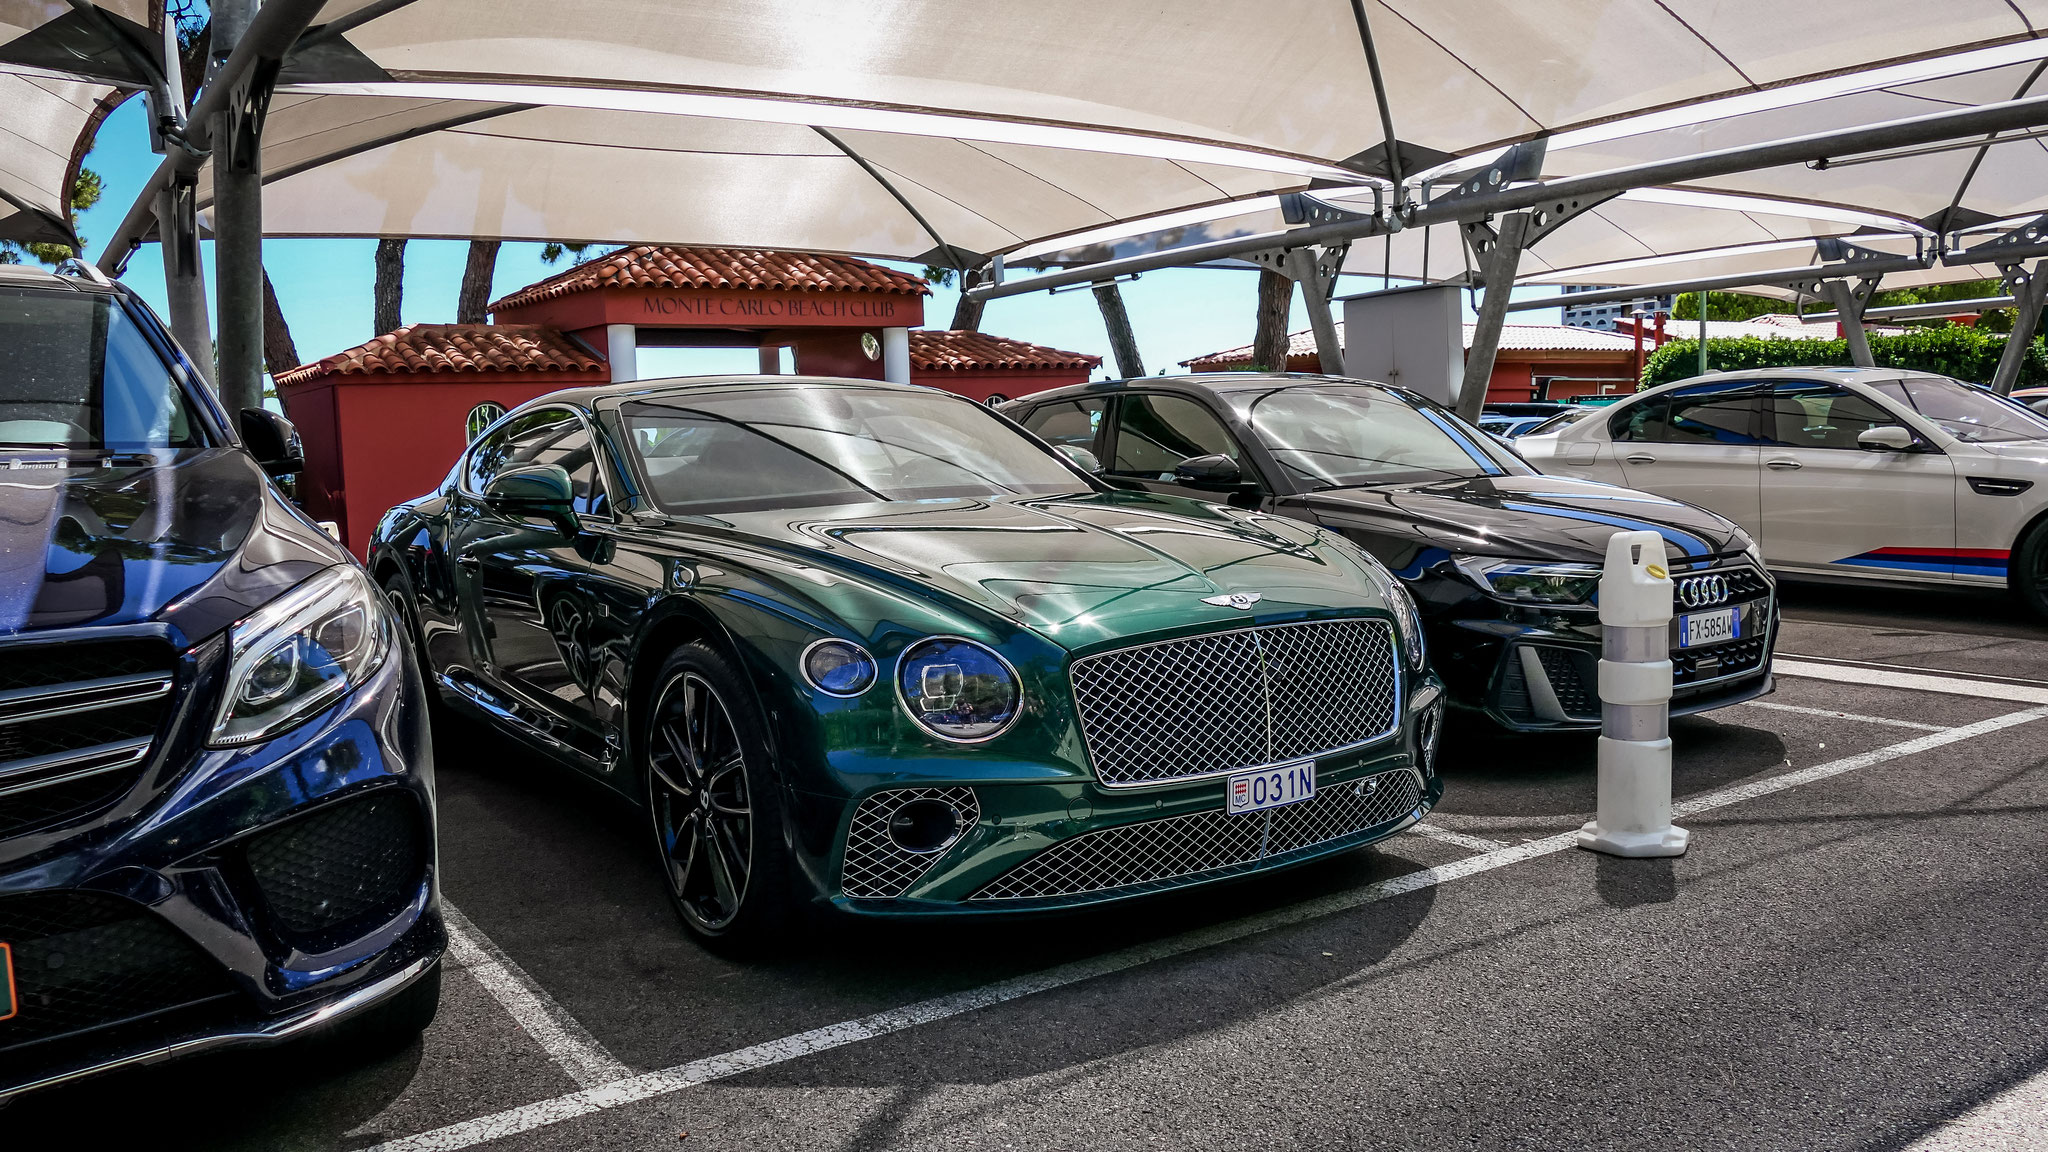 Bentley Continental GT - 031N (MC)